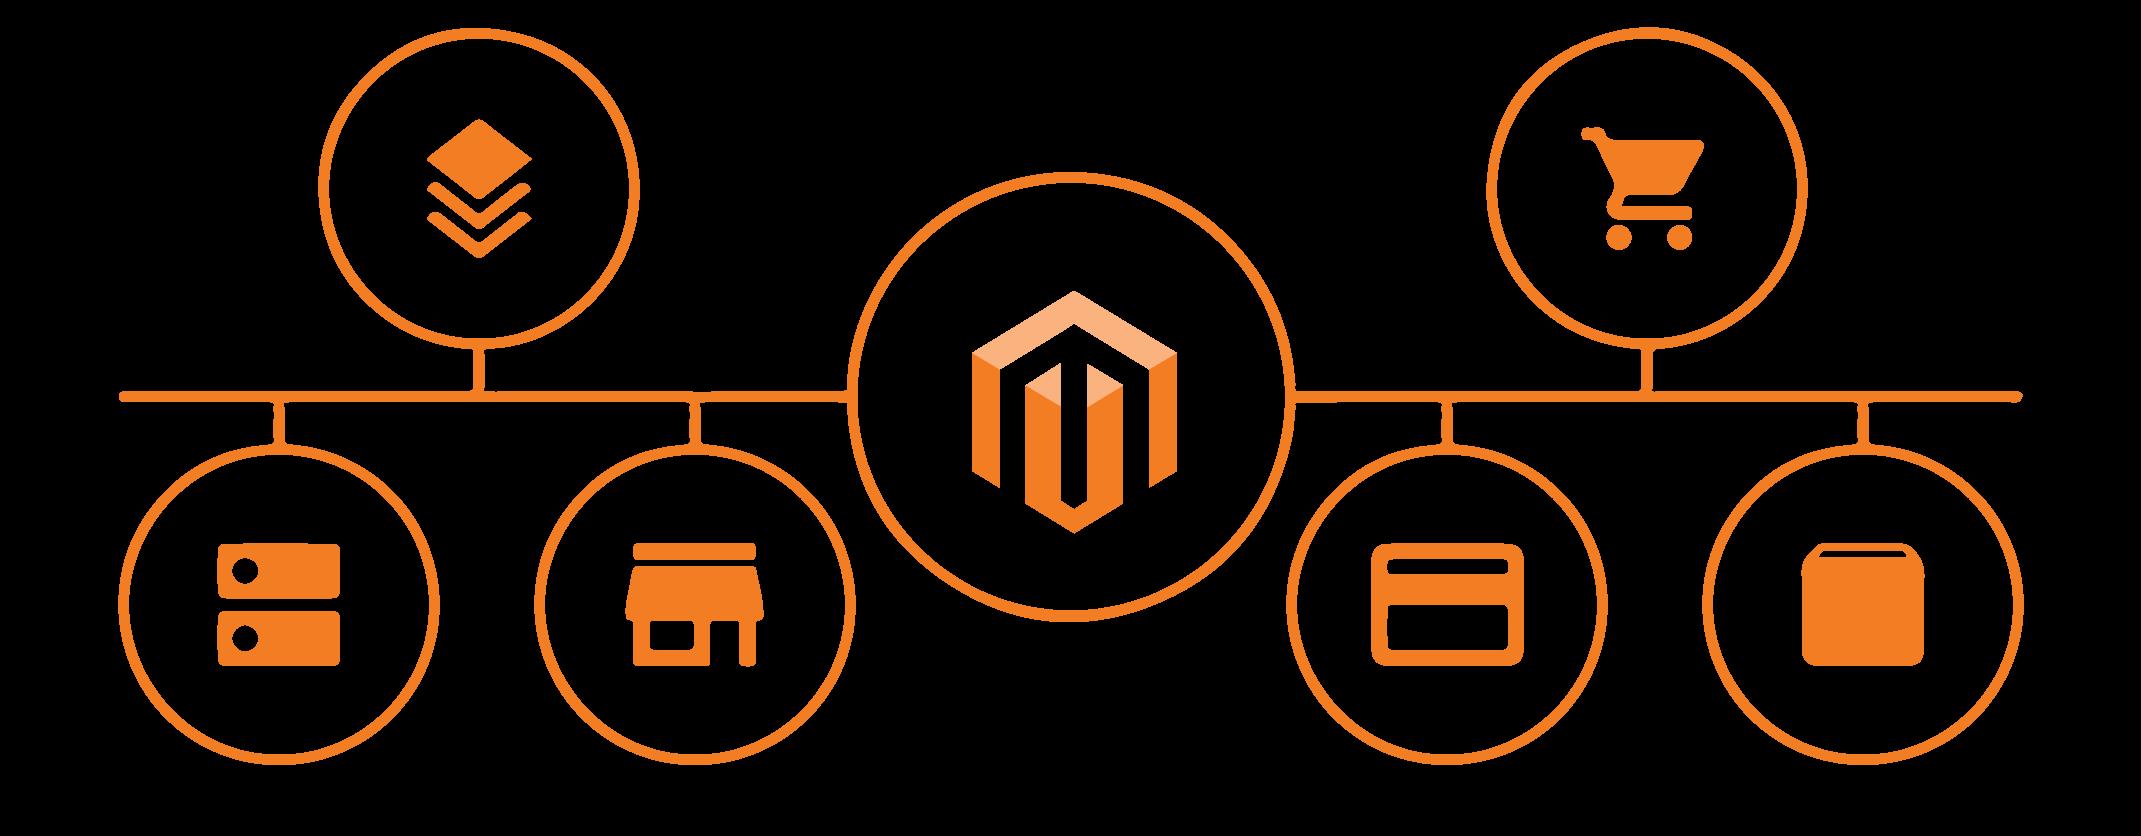 Magento 2.0 integrations